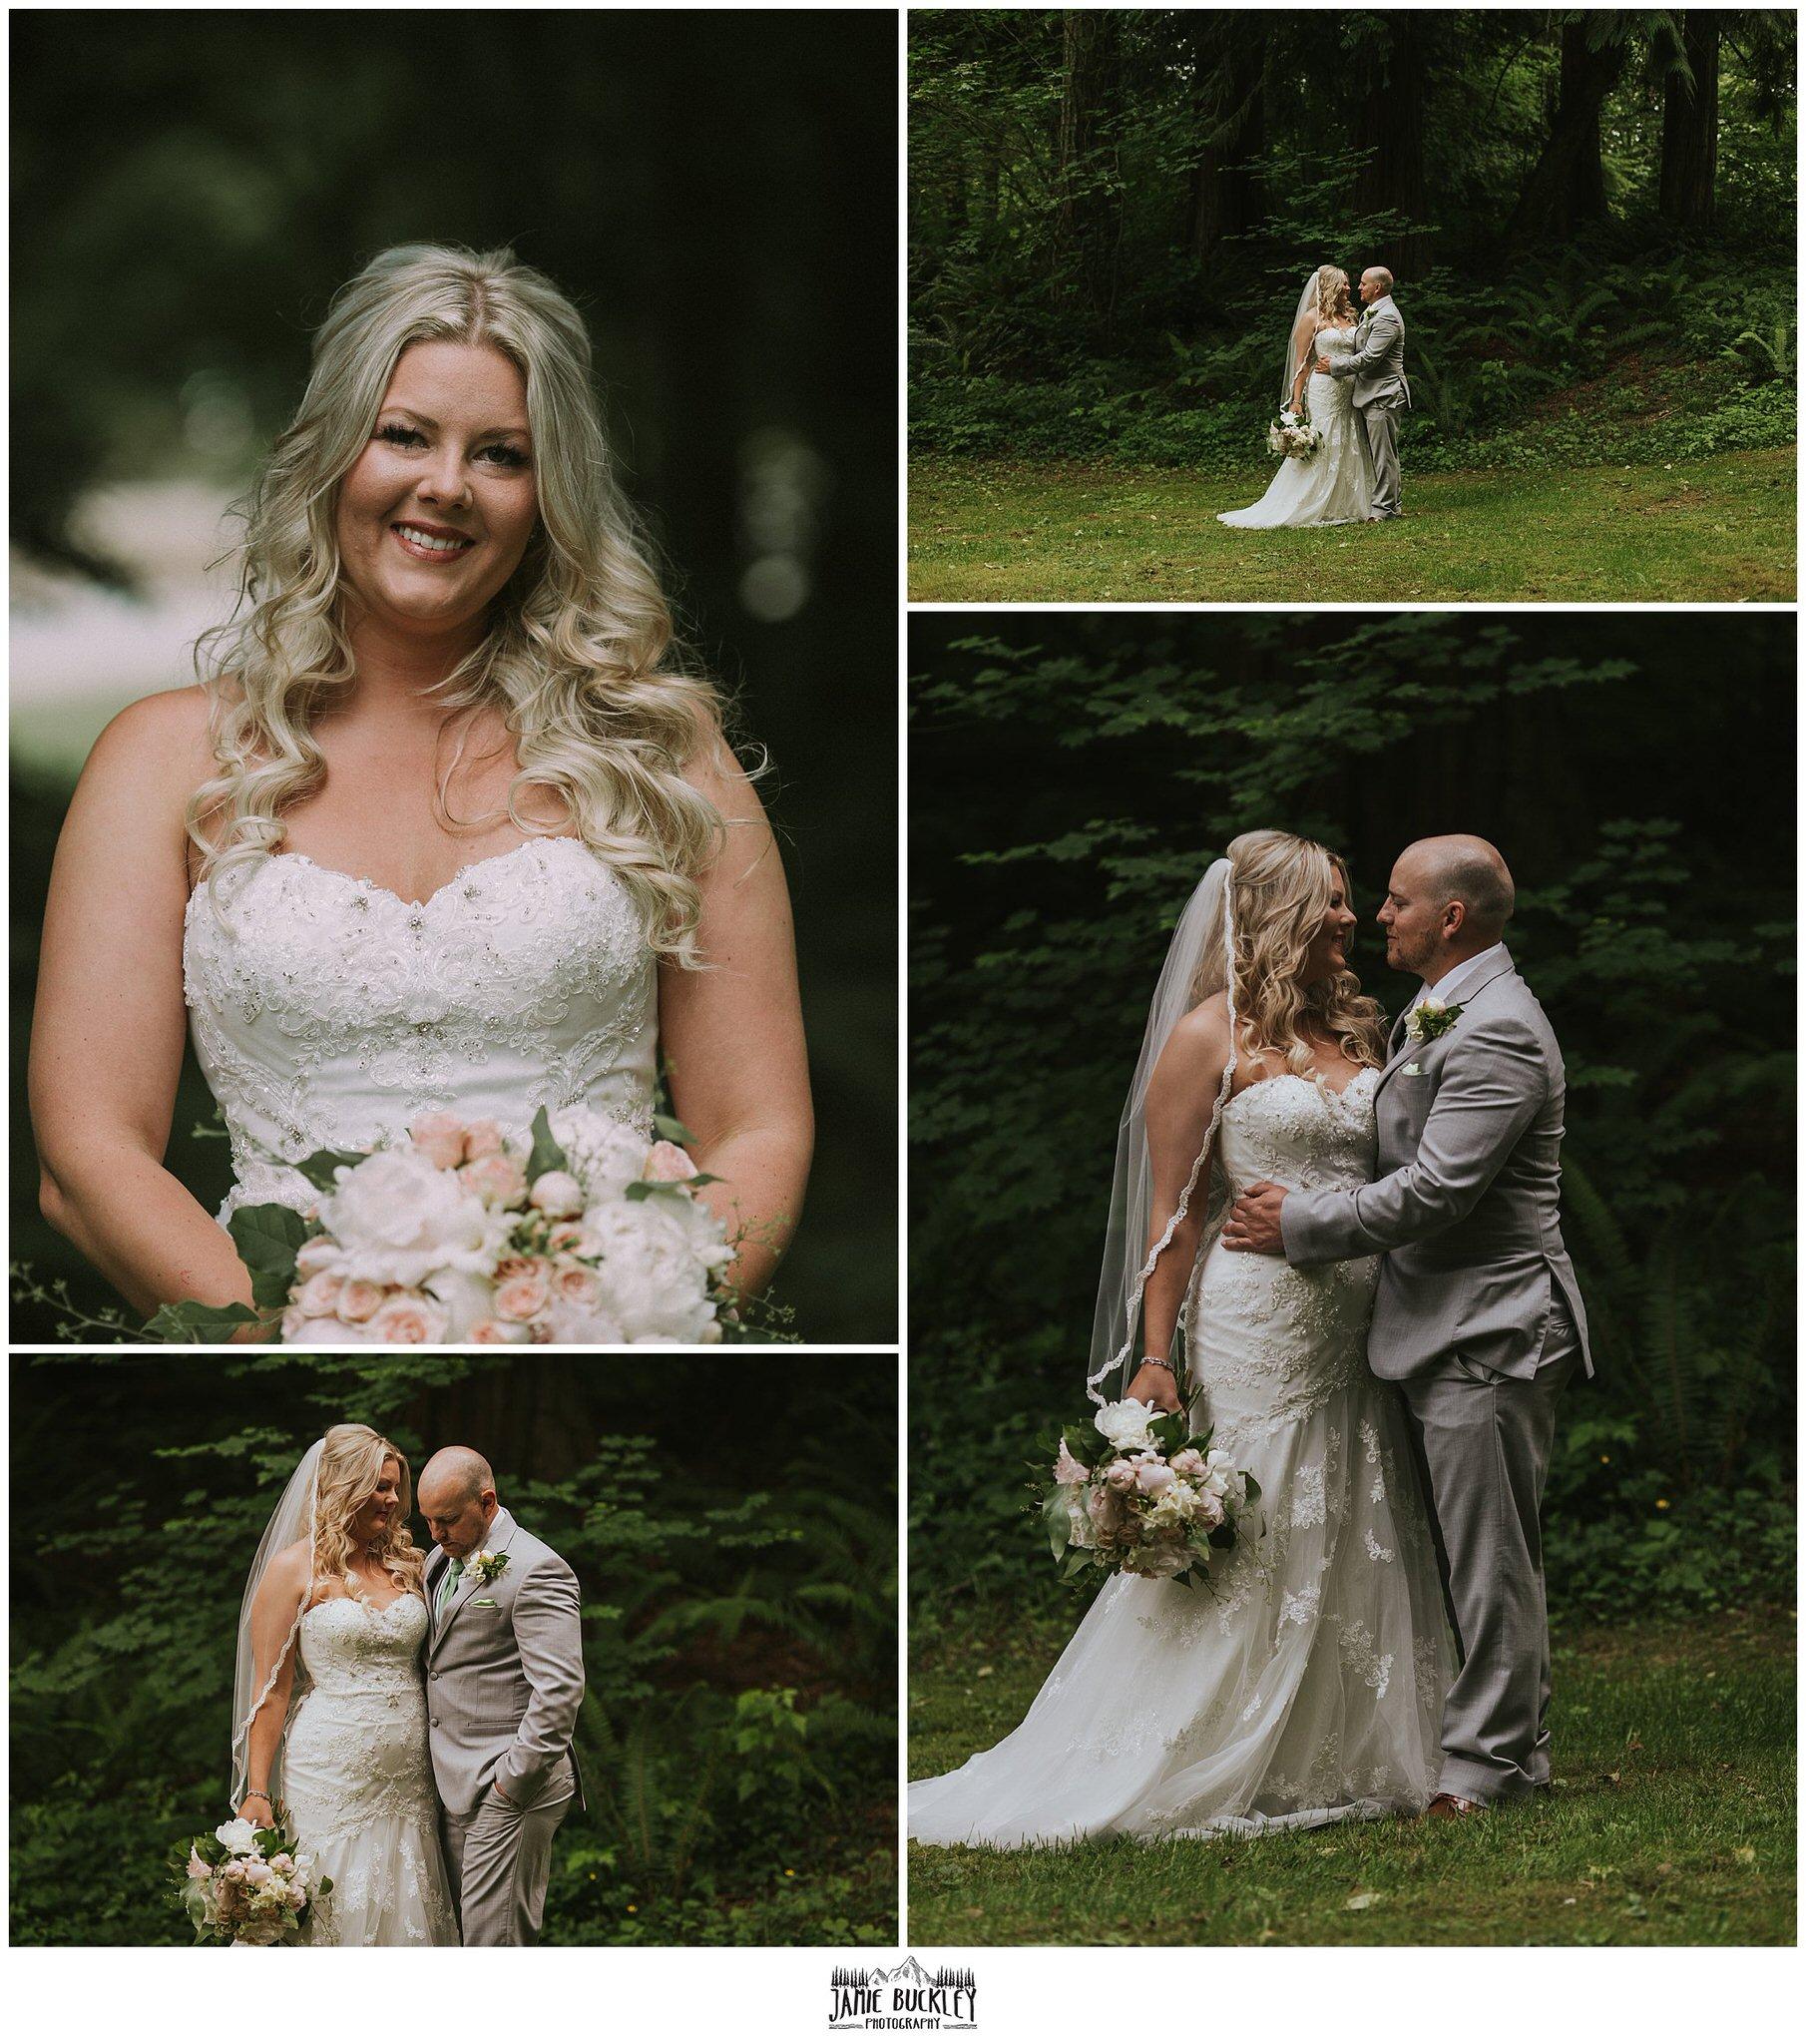 bride and groom before wedding